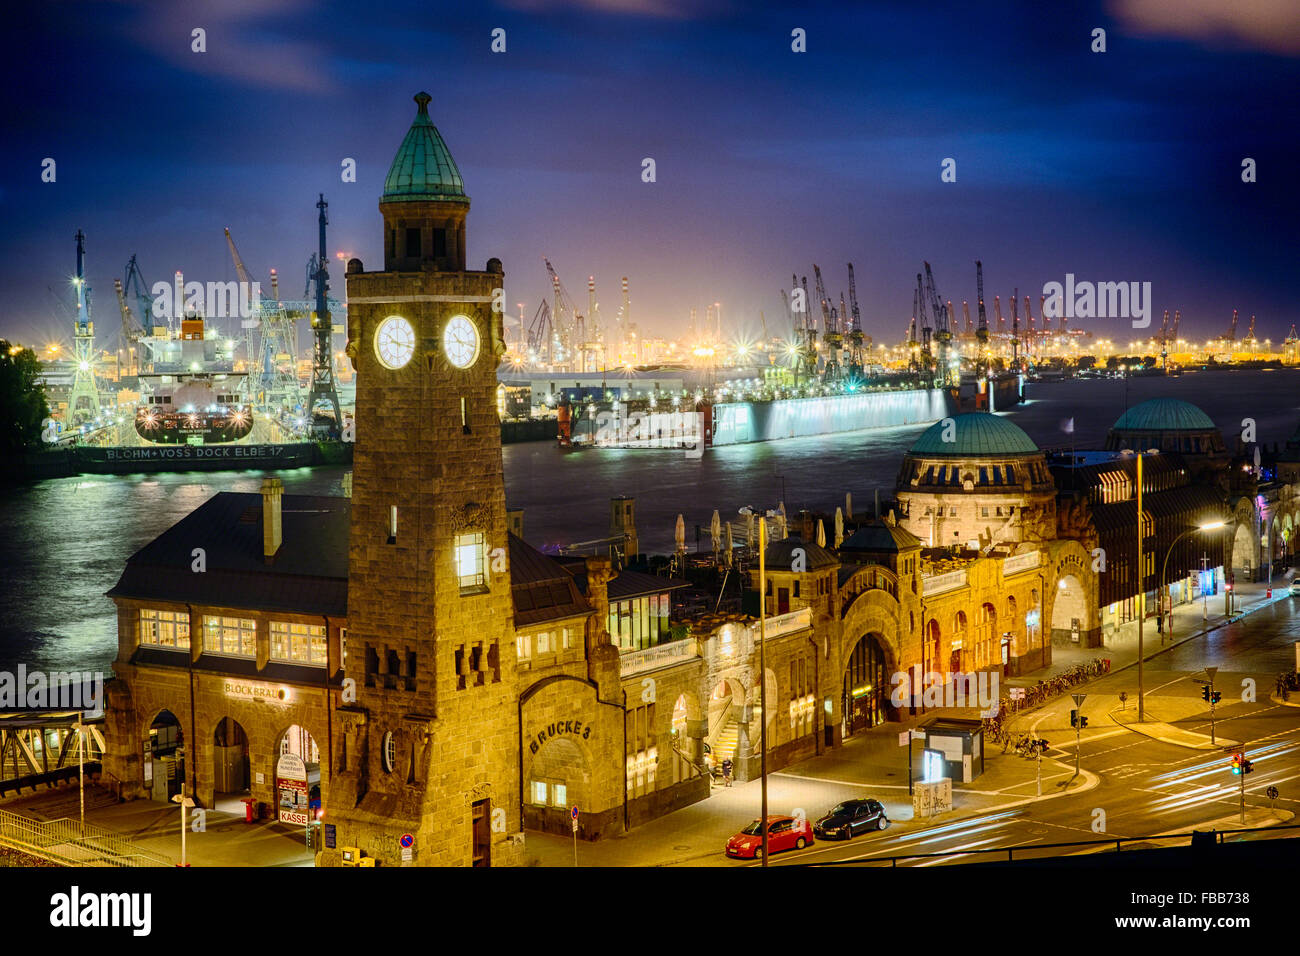 High Angle View of The Port Of Hamburg at Pier 3 at Night, St Pauli, Hamburg, Germany - Stock Image